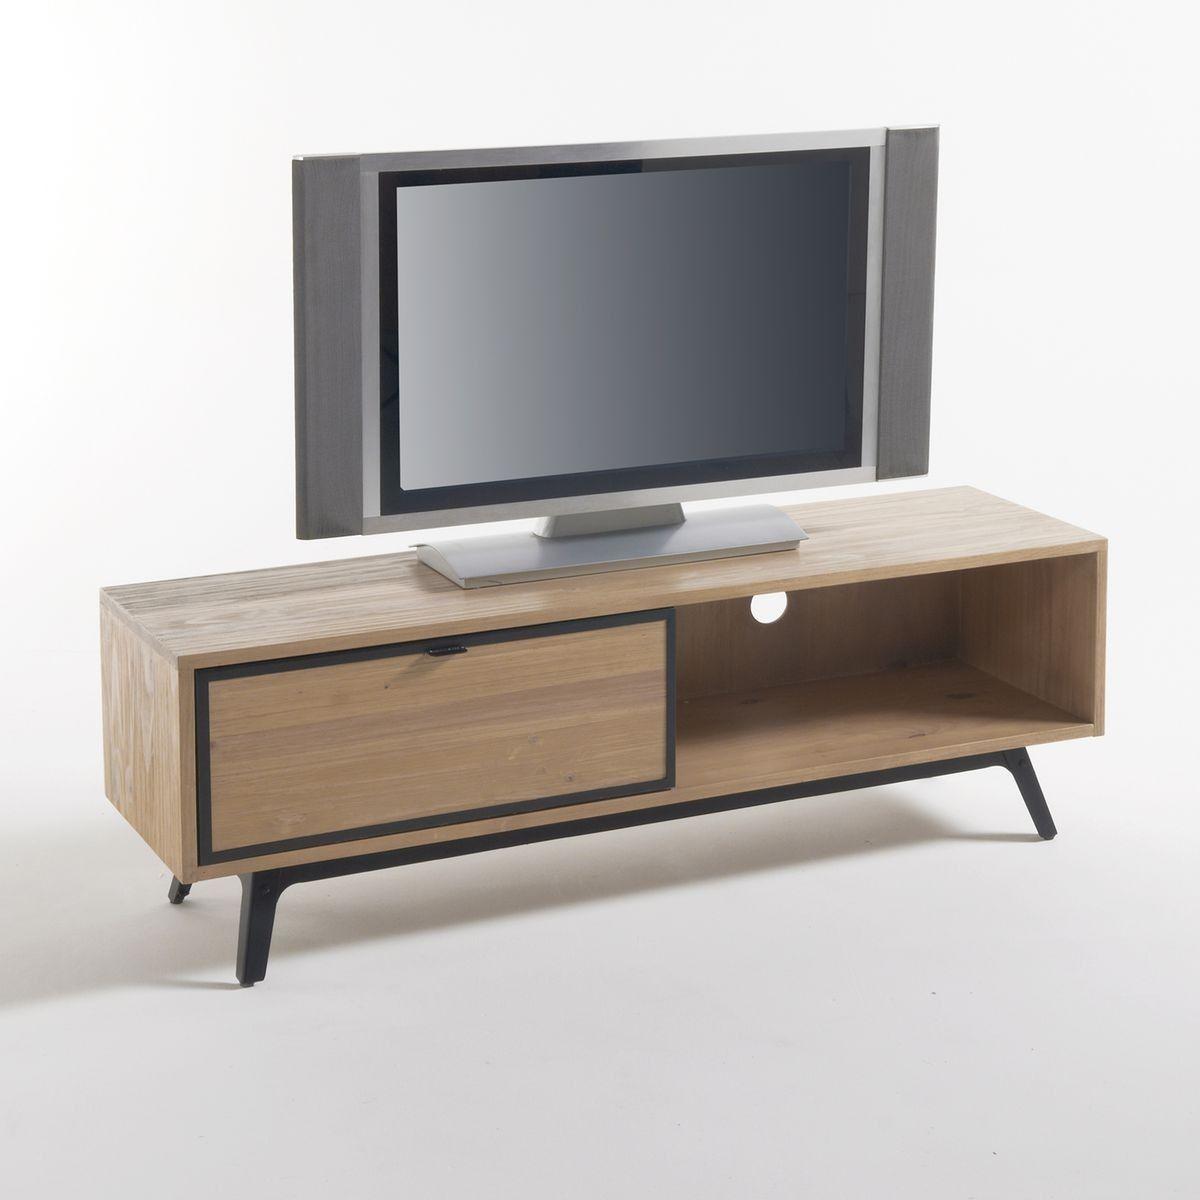 Meuble Tv Hifi Intégré meuble tv-hifi daffo | meuble tv hifi, meuble et meuble tv